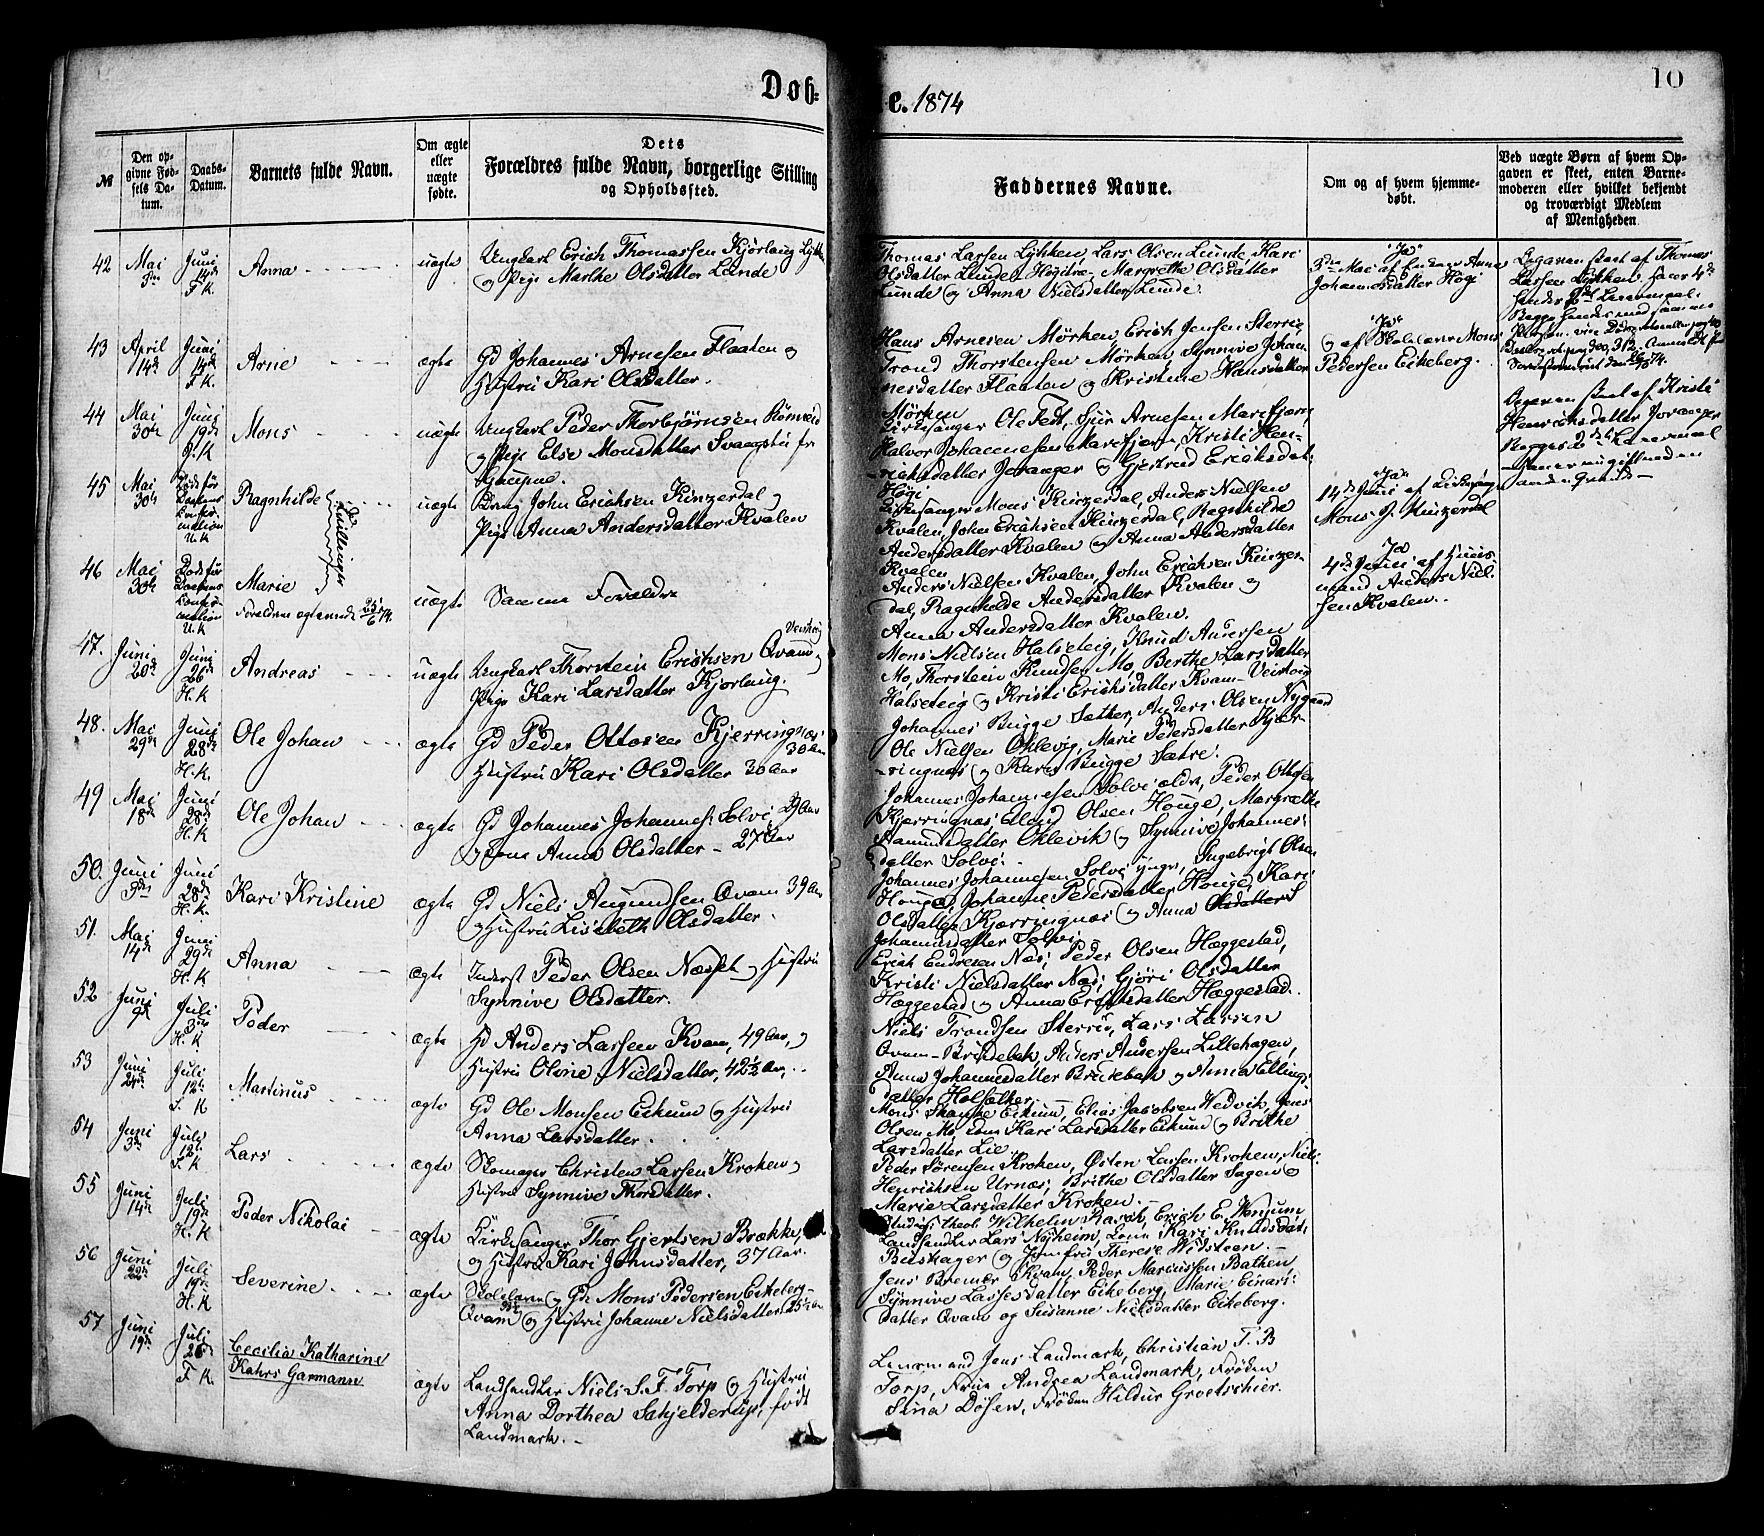 SAB, Hafslo Sokneprestembete, H/Haa/Haaa/L0011: Ministerialbok nr. A 11, 1873-1886, s. 10